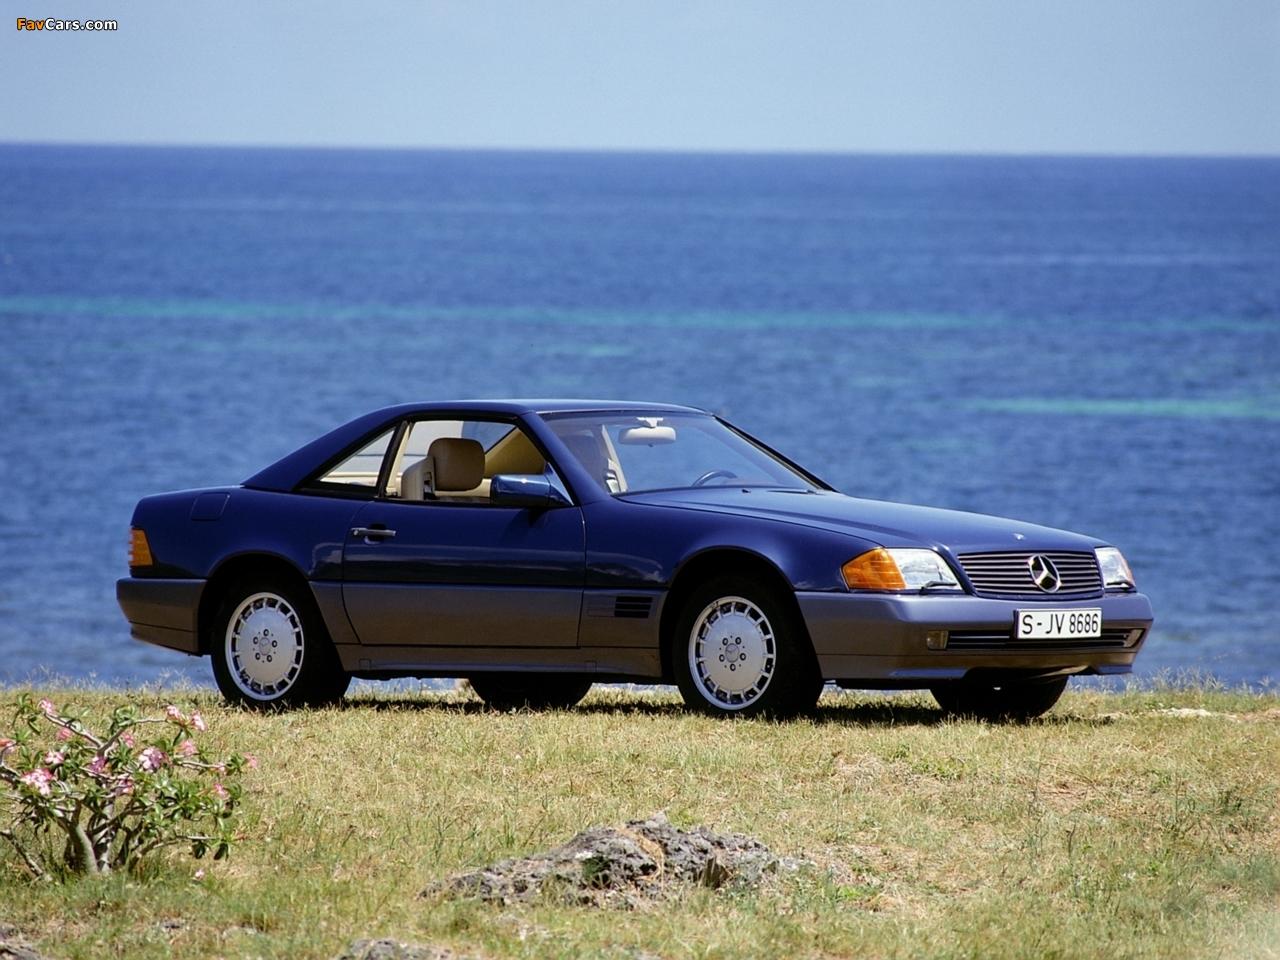 Mercedes-Benz SL-Klasse (R129) 1988-2001 wallpapers (1280x960)